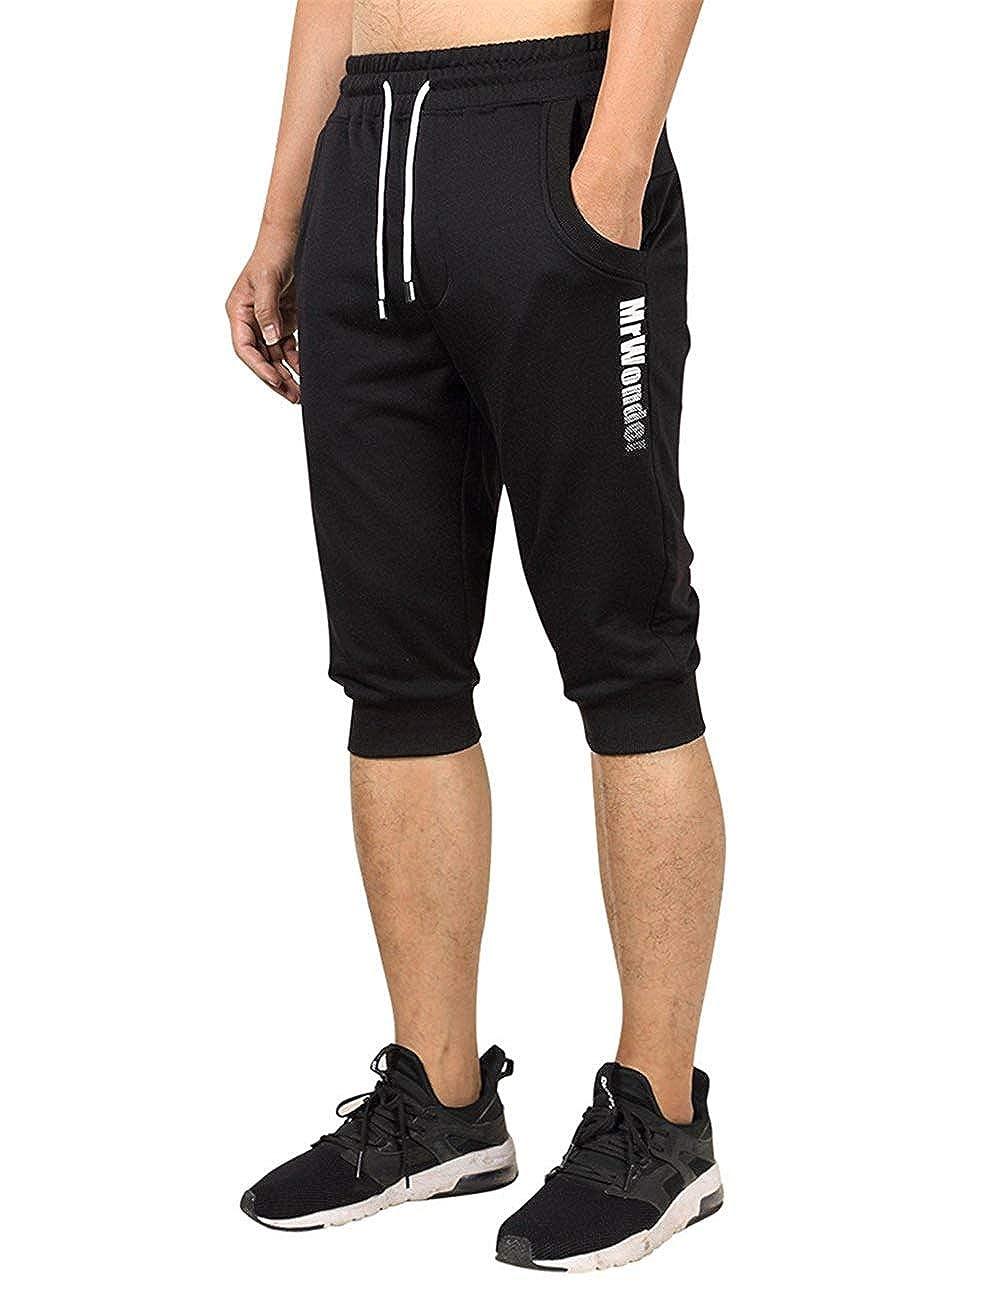 Black XXLarge Men Sport Jogging Short Pant Fit Elastic Casual Sportswear Slim Trouser